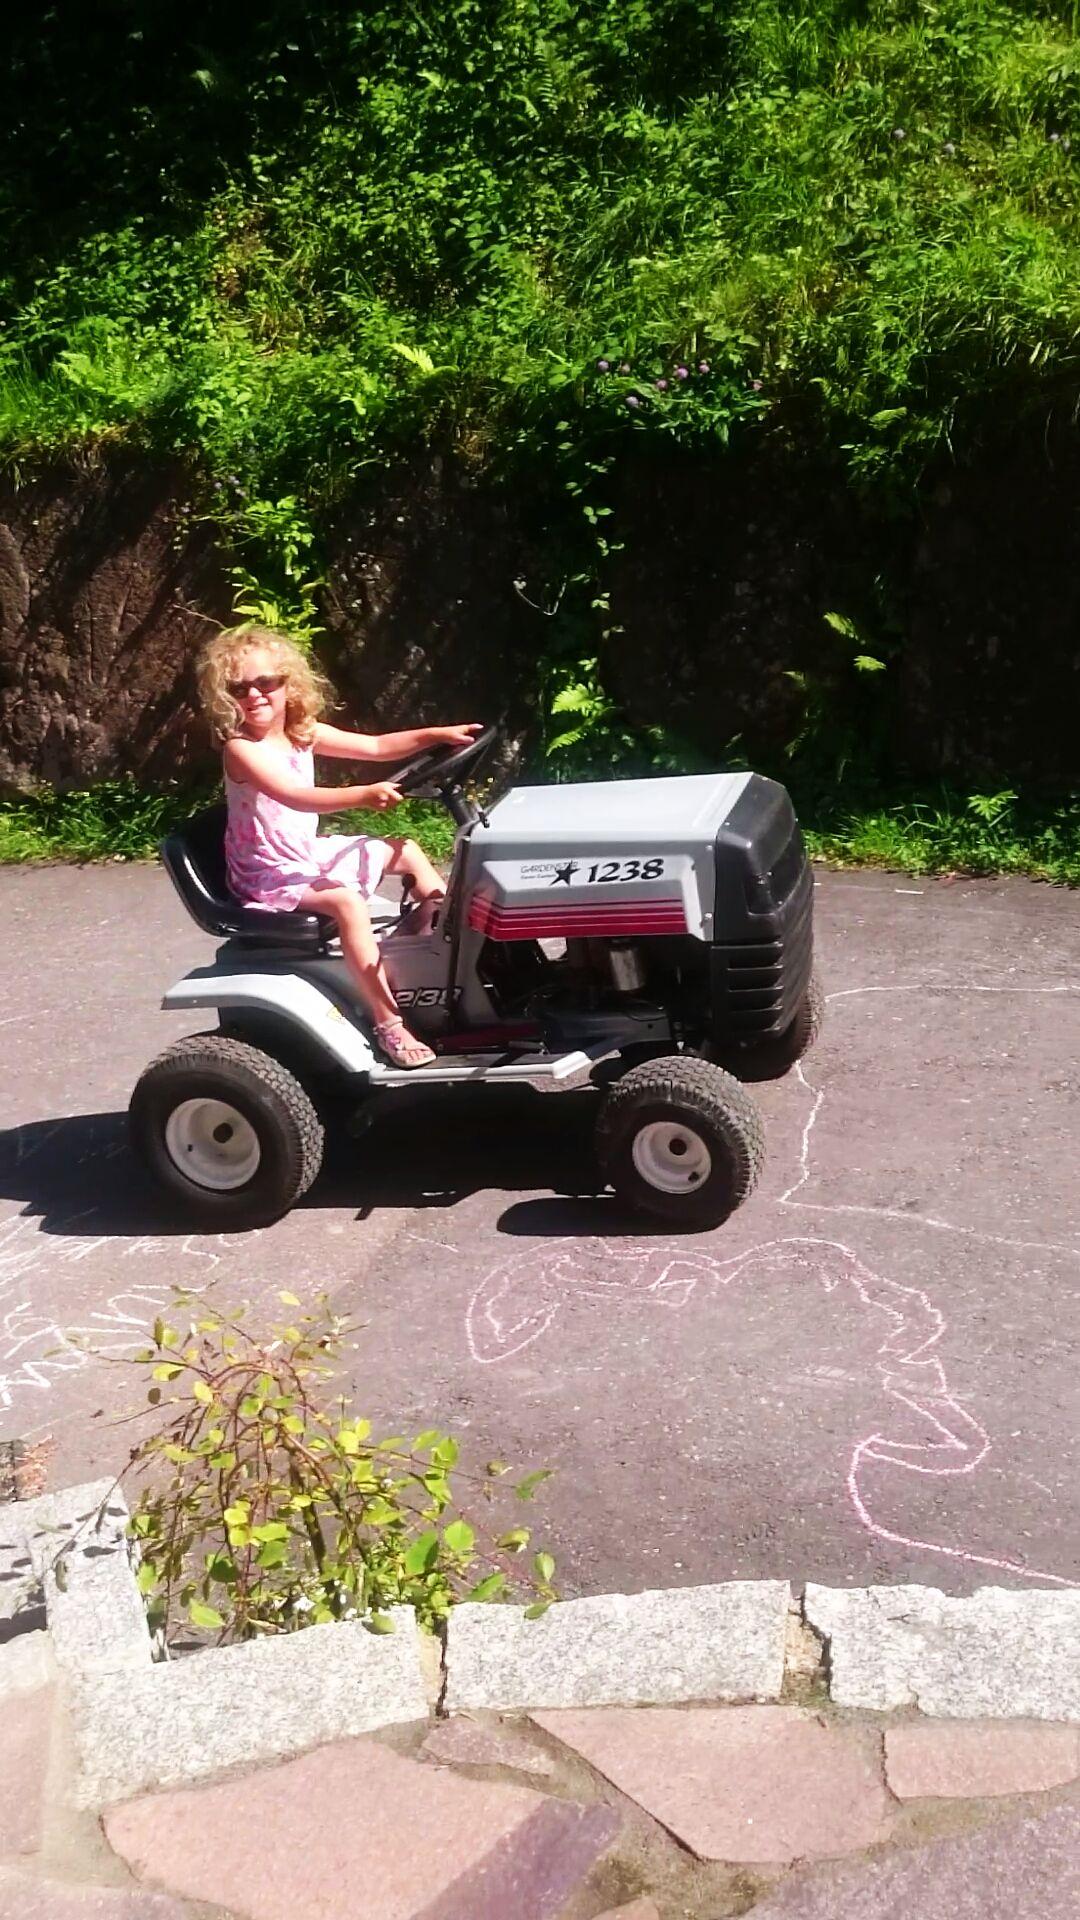 Kindertraktor mit 4-Takt-Motor